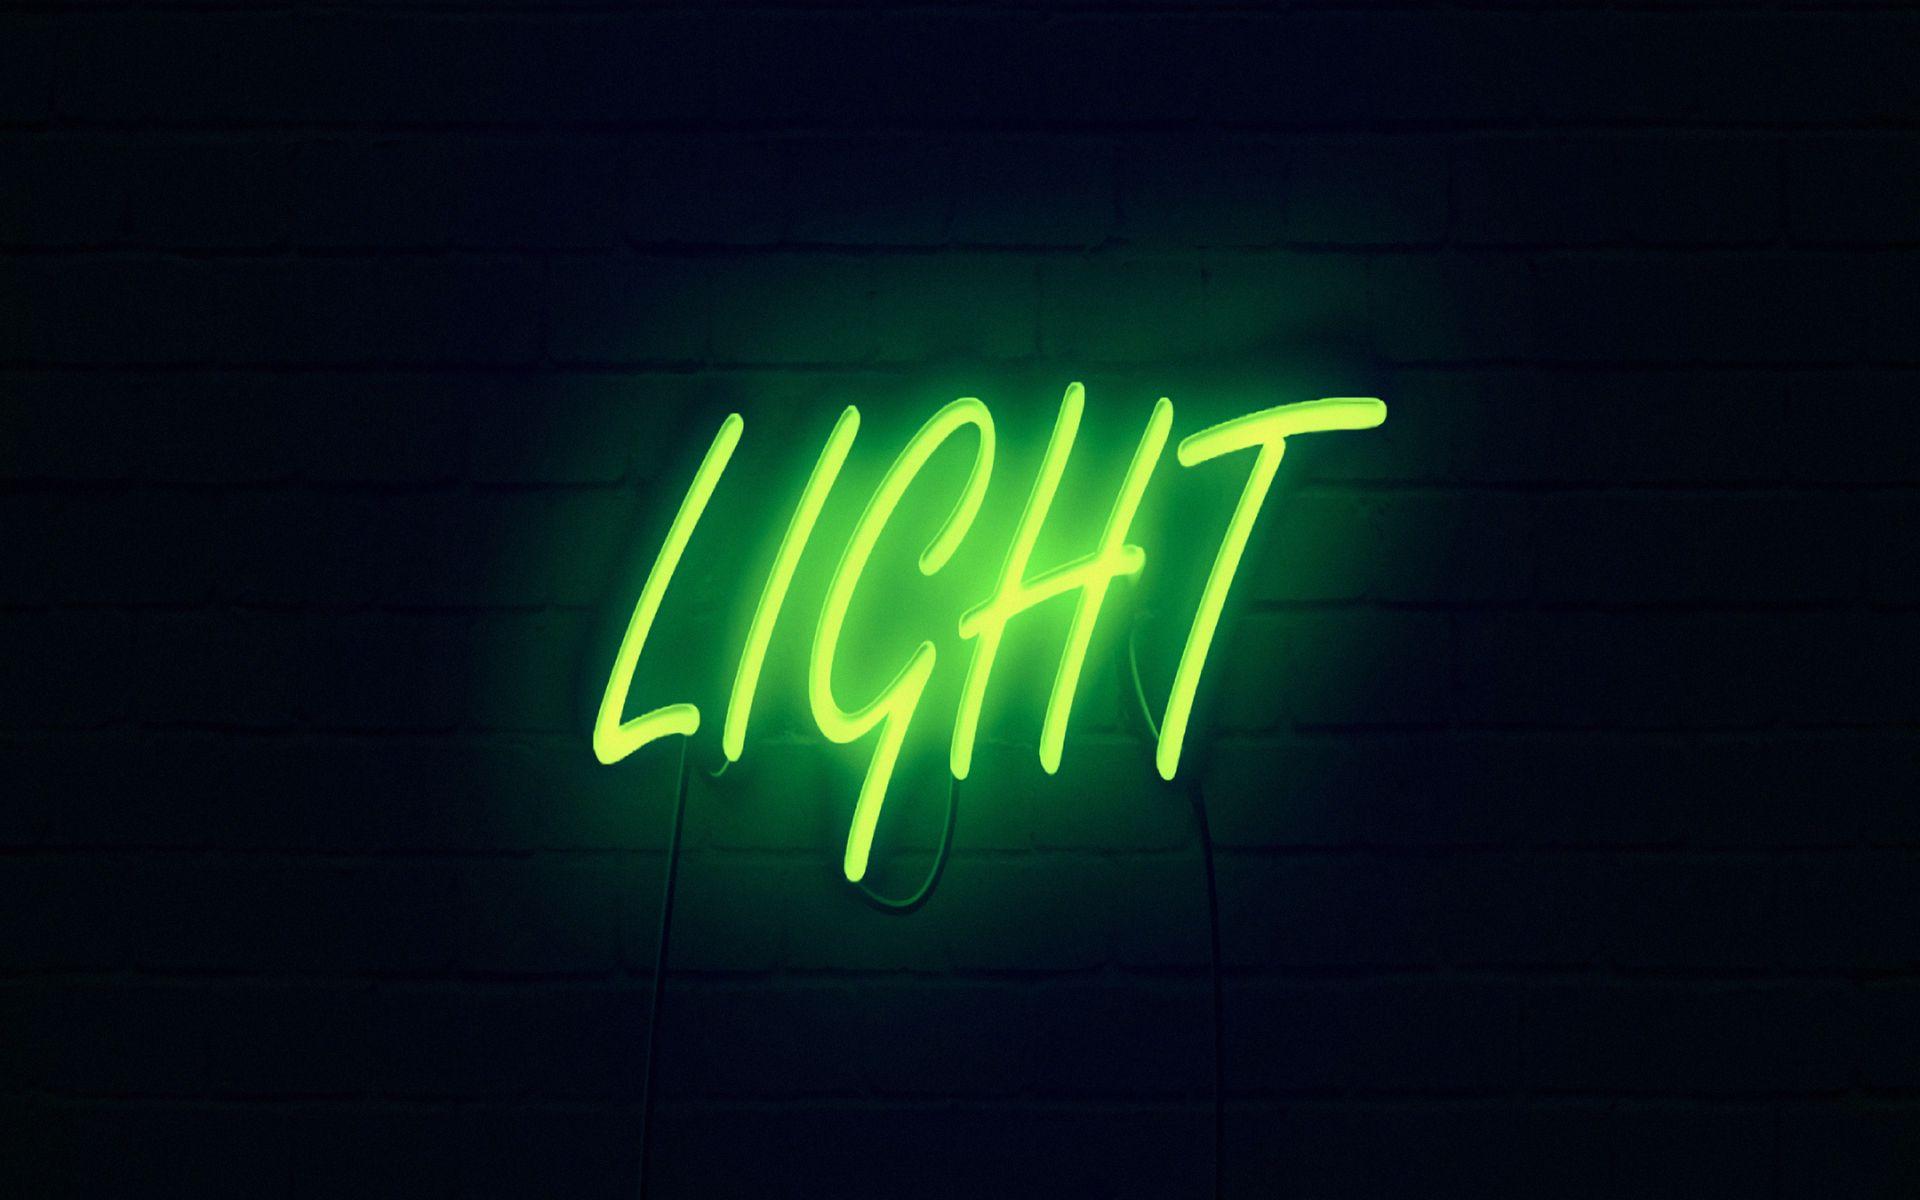 1920x1200 Wallpaper light, neon, inscription, dark, yellow